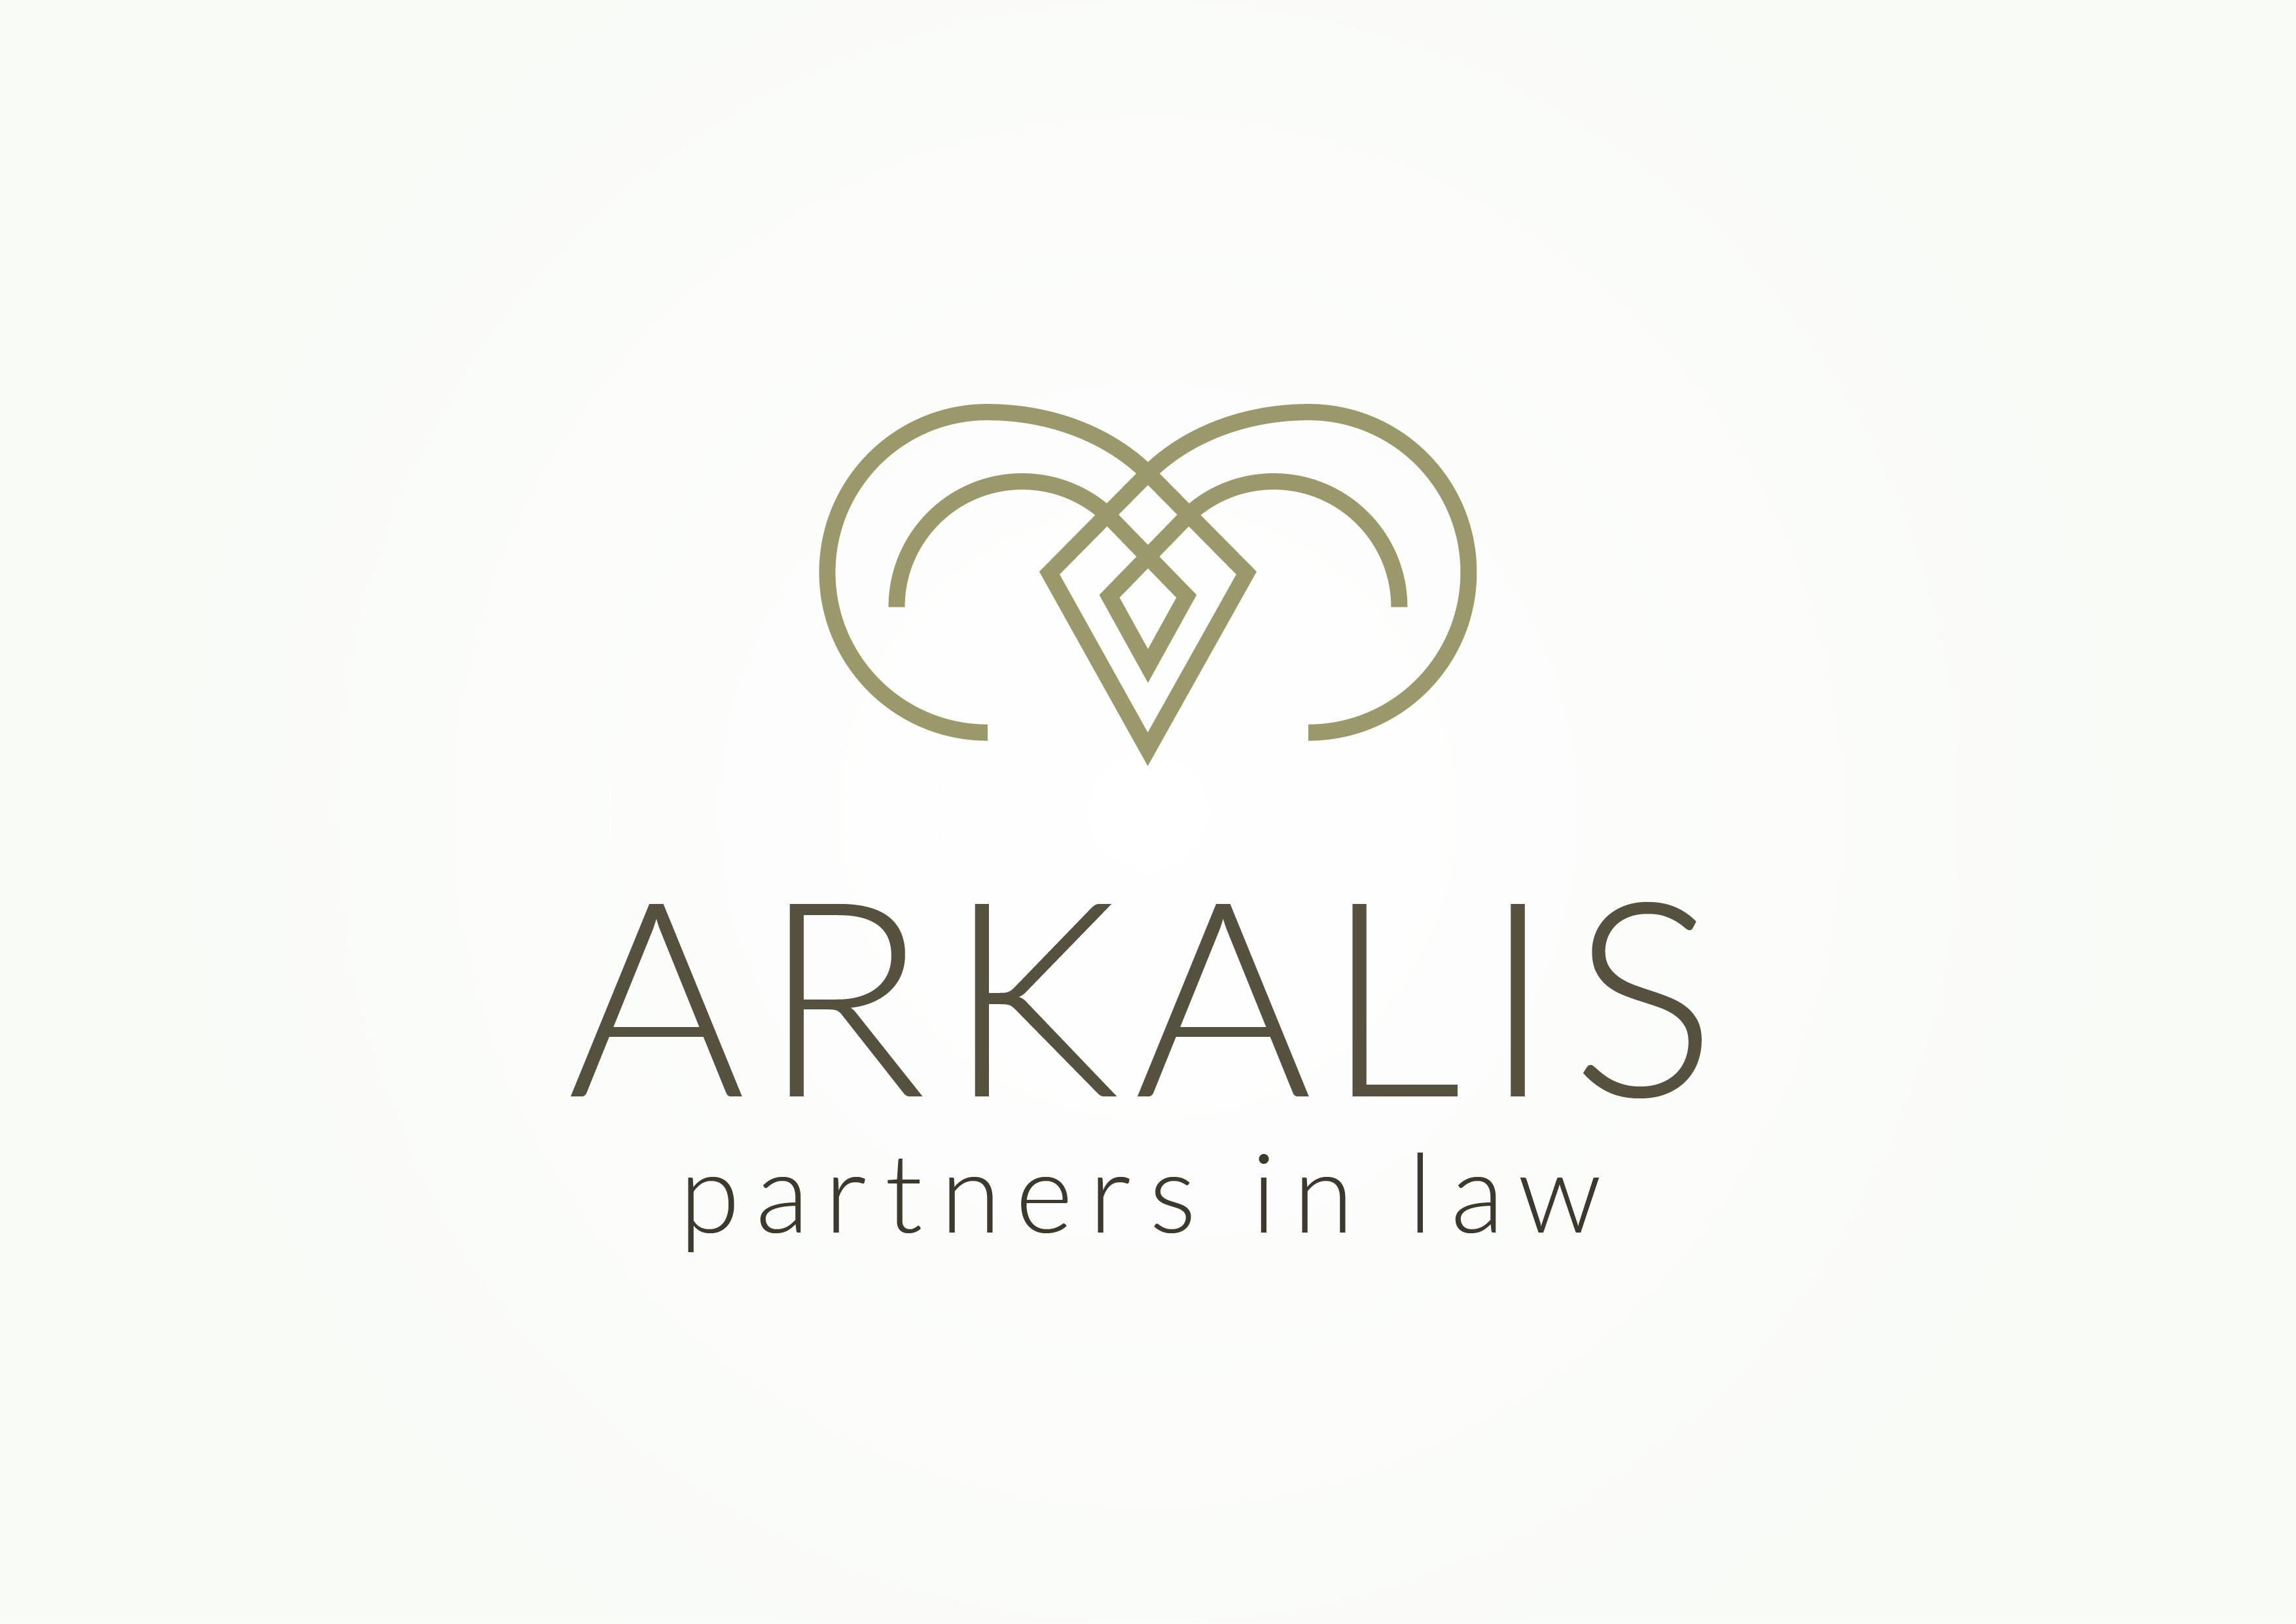 Arkalis